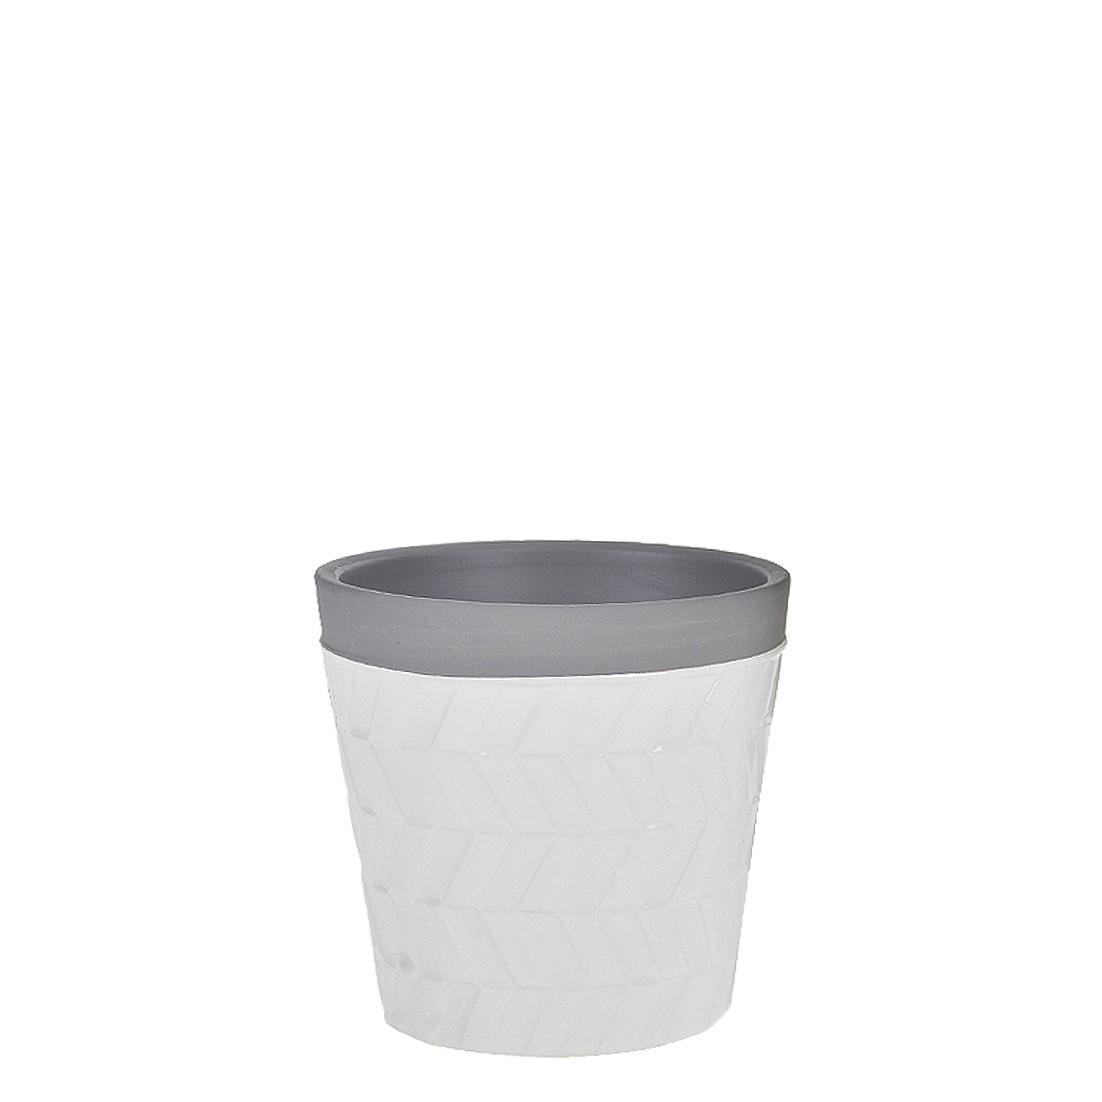 Vaso Decorativo Ceramica 10cm Redondo - GPresentes